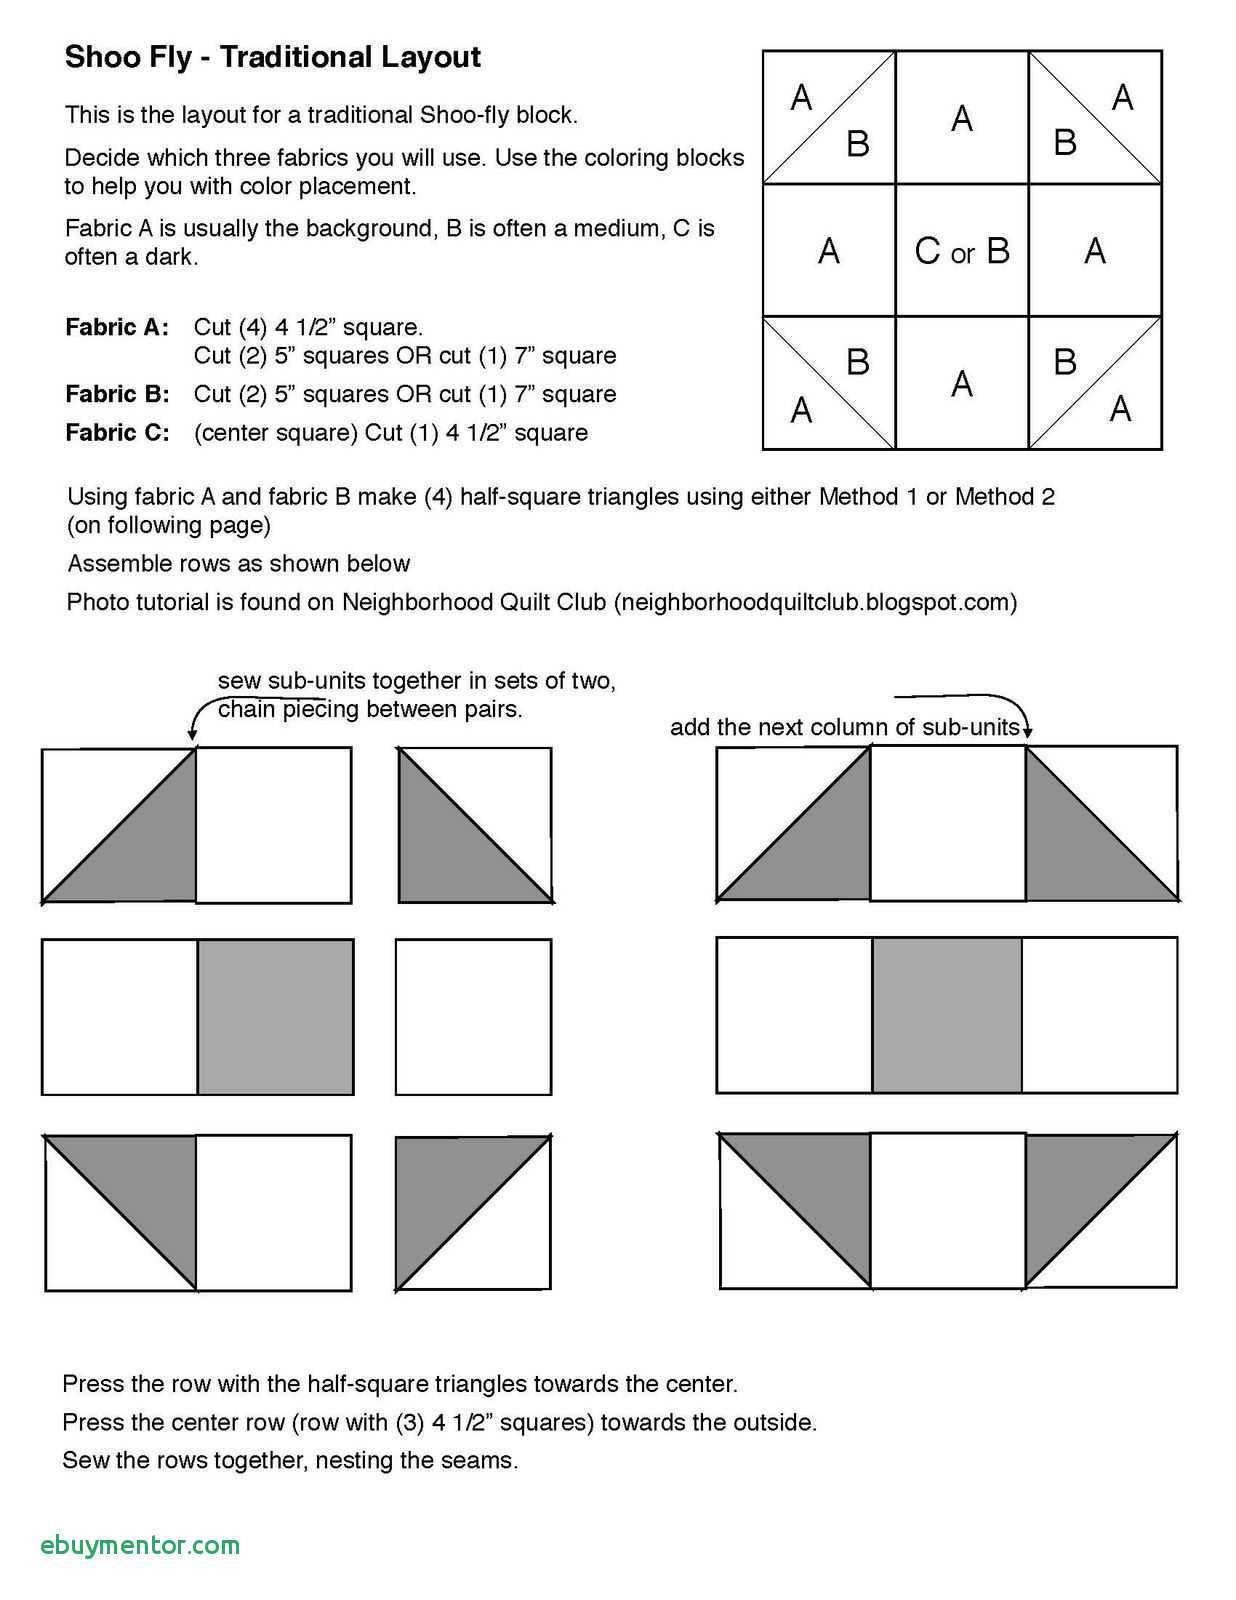 Ausmalbilder 2. Klasse Frisch Square Coloring Pages Best 35 Ausmalbilder Baum forstergallery Stock